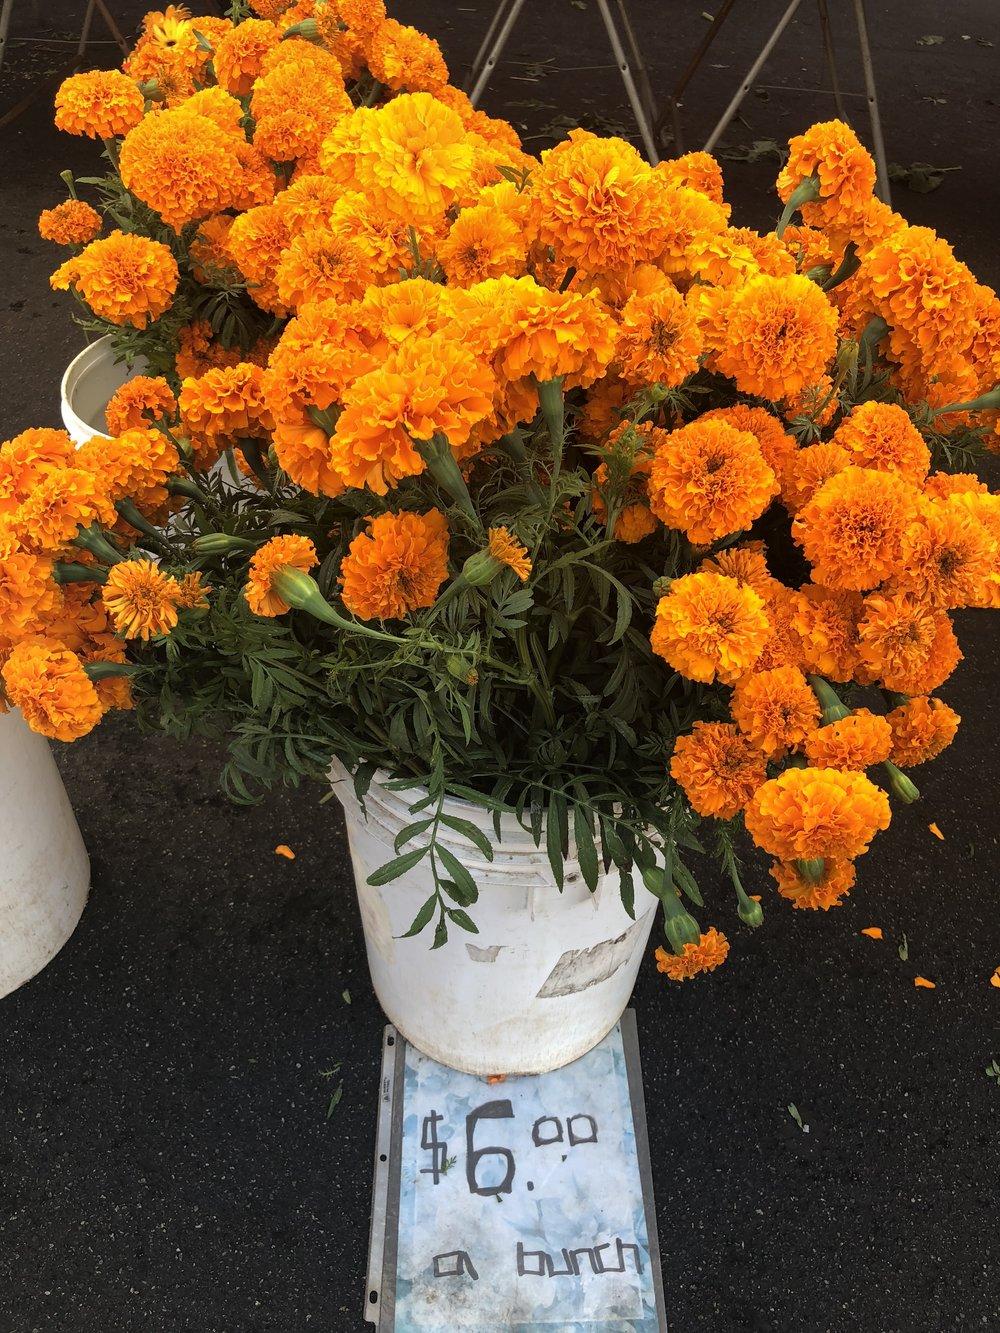 Marigolds: Farmer's Market $6.00